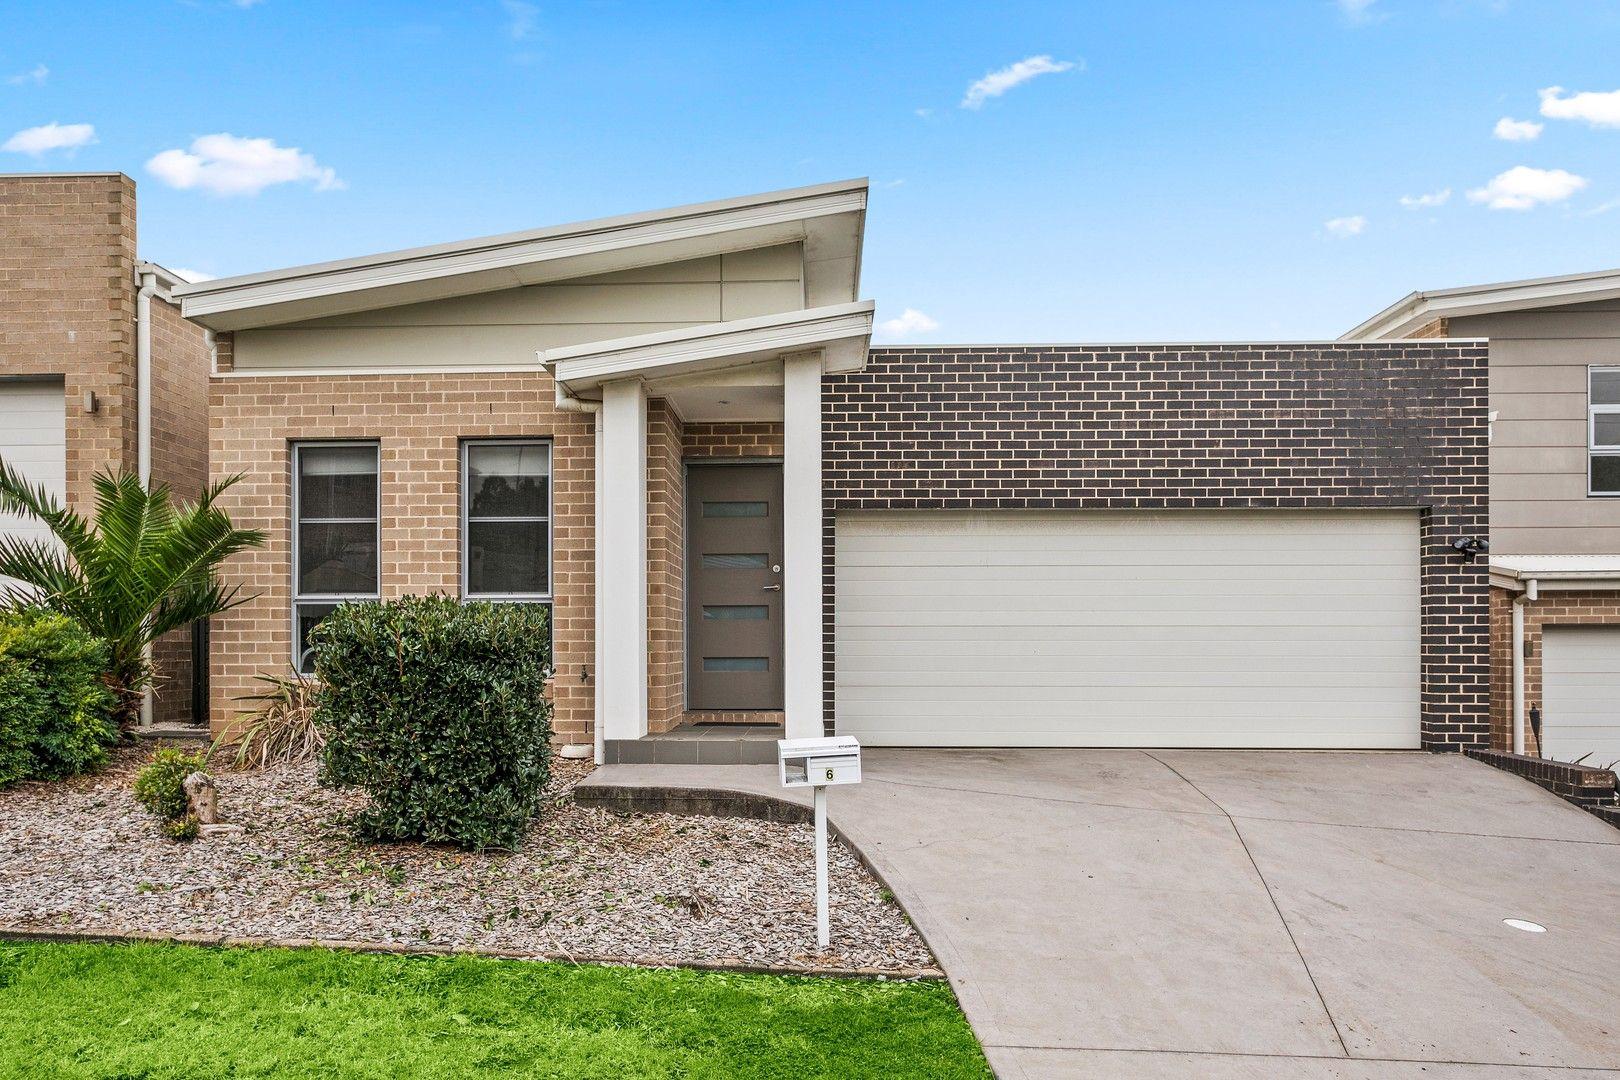 6 Jemima Close, Flinders NSW 2529, Image 0